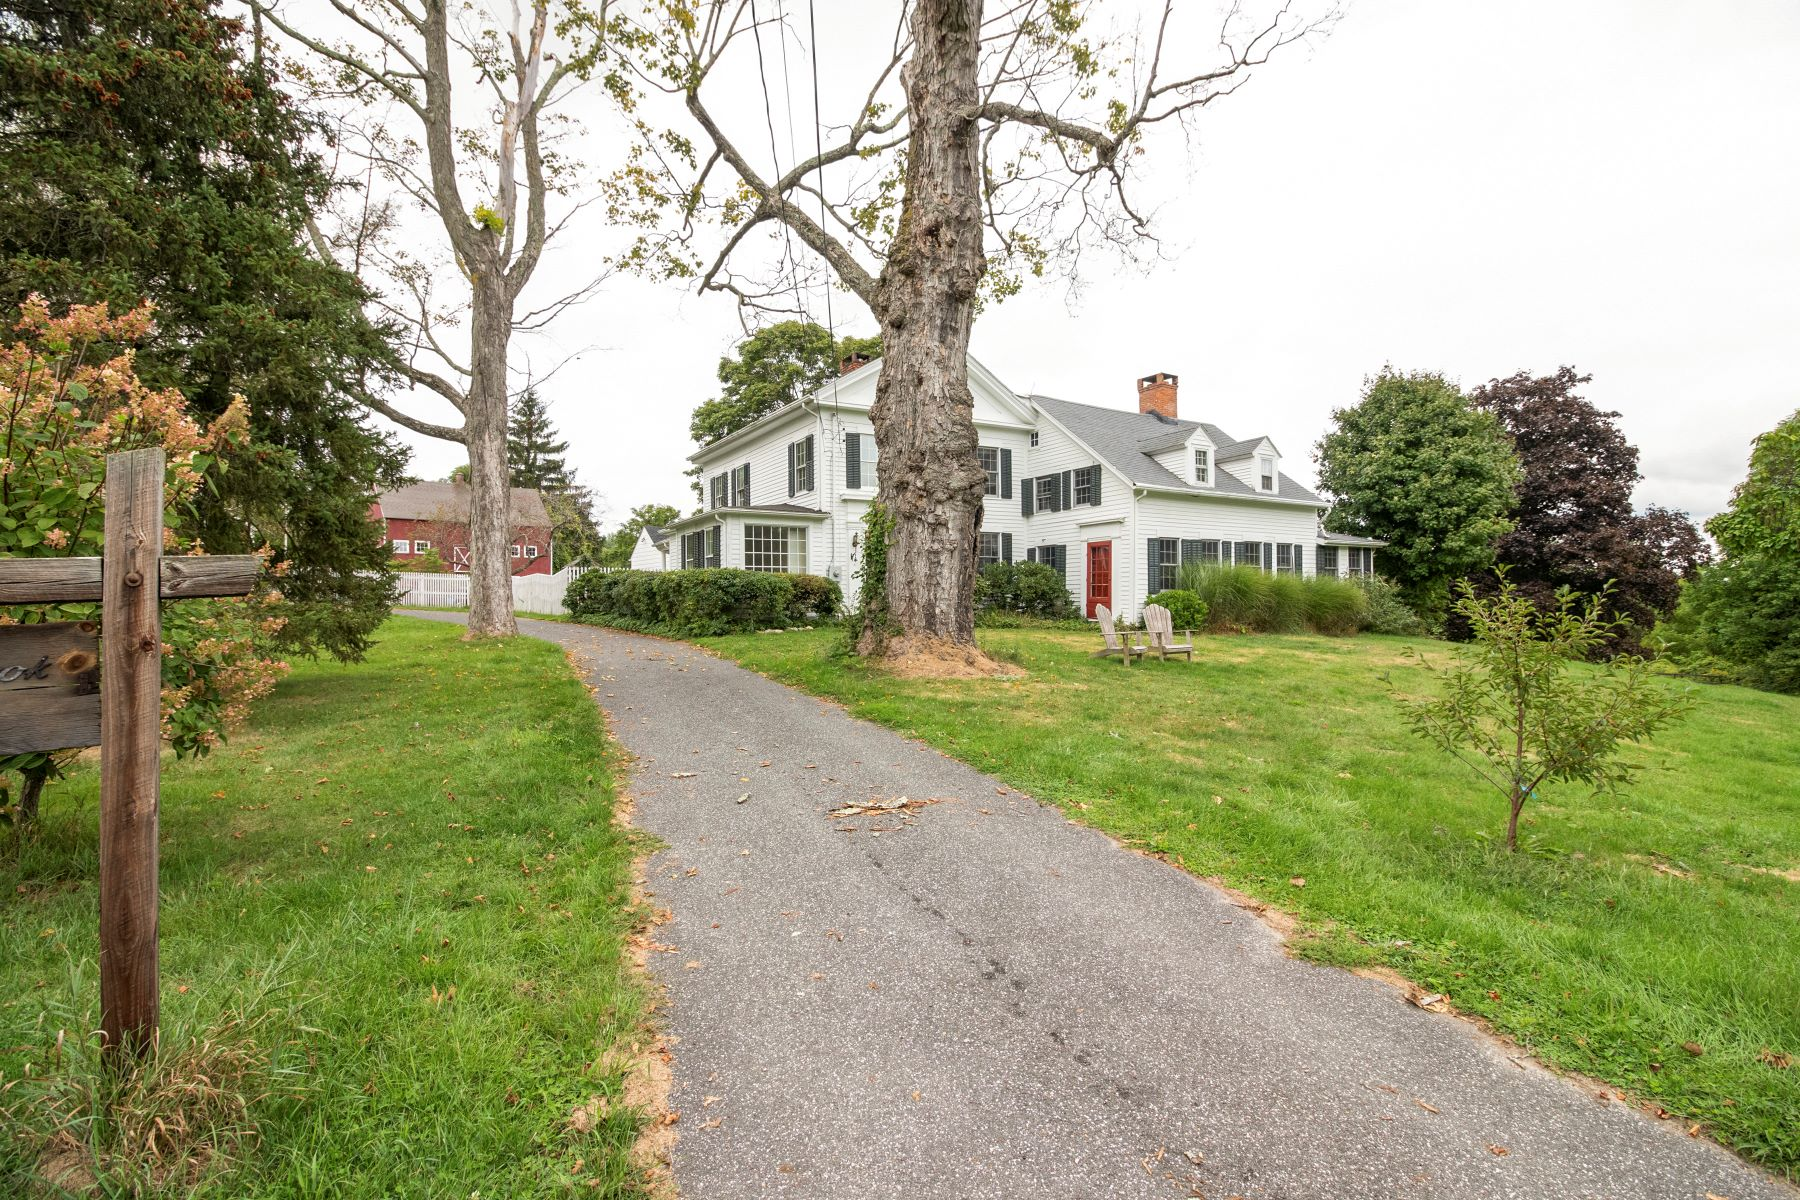 Single Family Homes для того Продажа на Own A Piece Of Southbury History 708 Spruce Brook Road Southbury, Коннектикут 06488 Соединенные Штаты